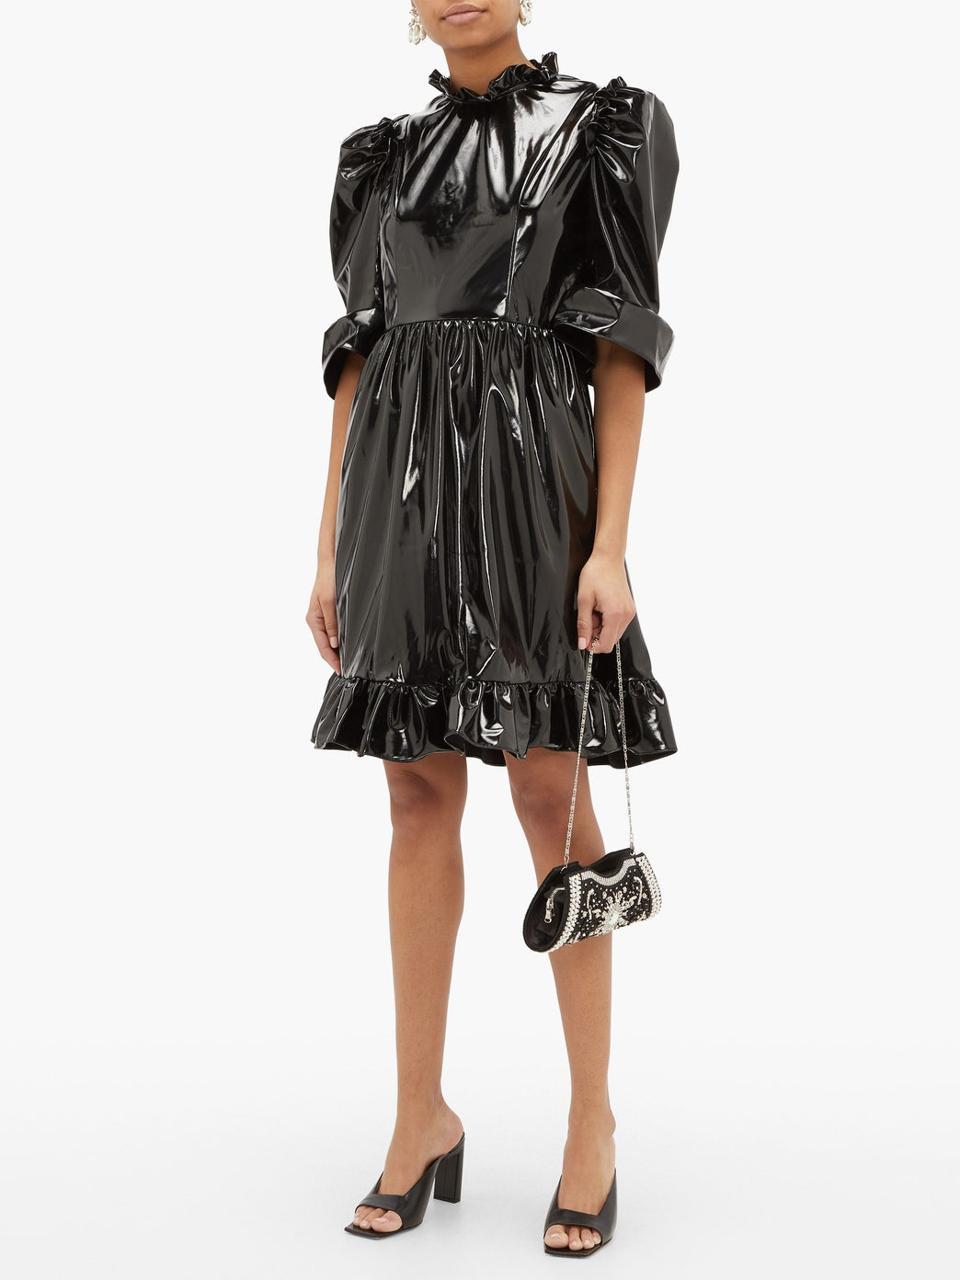 Spring ruffled PVC mini dress